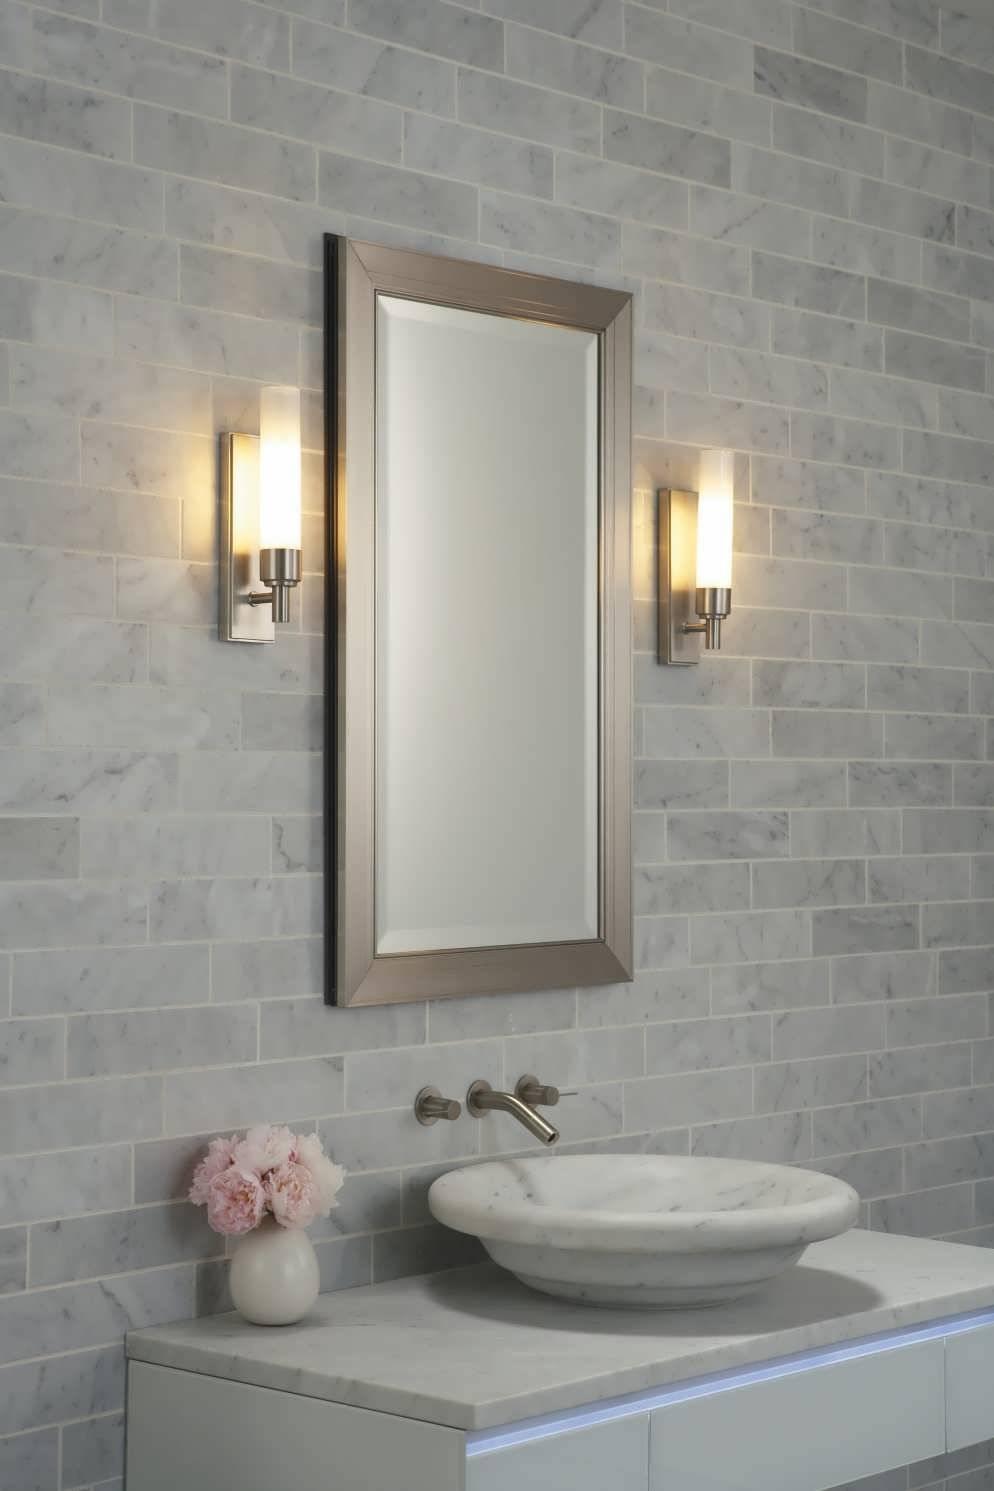 Bathroom : Fun Bathroom Mirrors Unusual Mirrors For Bathrooms pertaining to Unusual Mirrors for Bathrooms (Image 7 of 25)